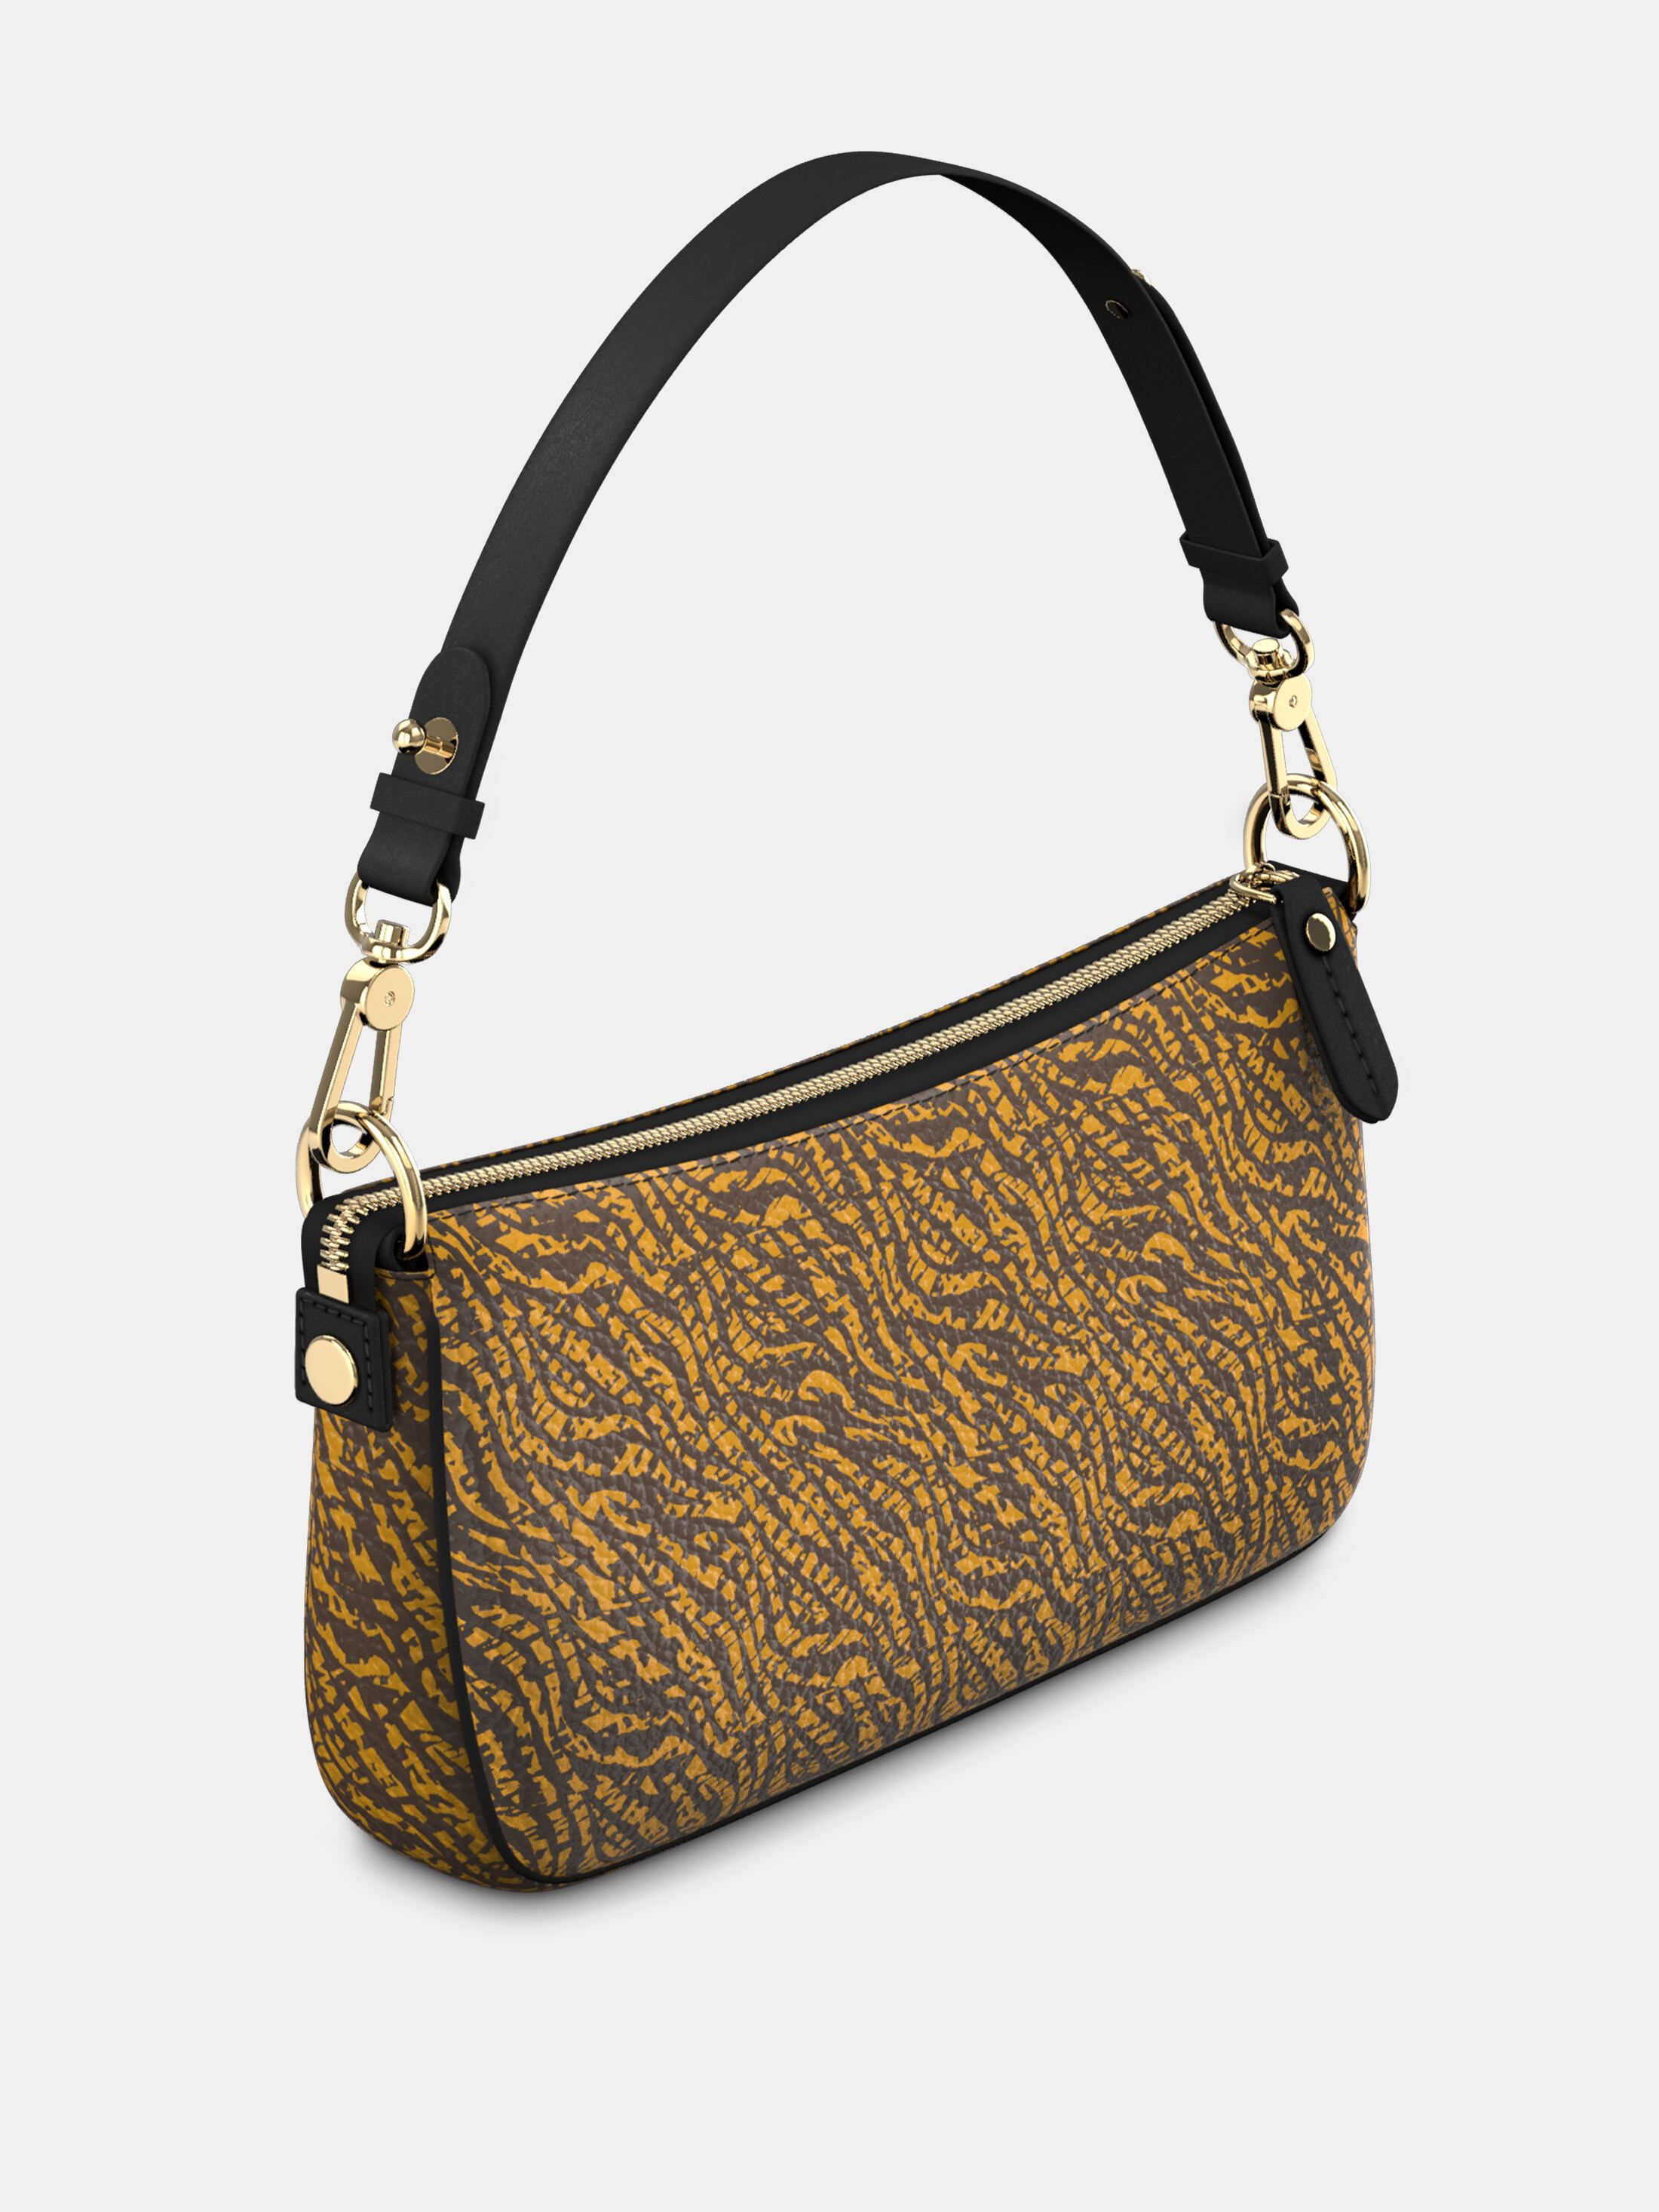 baguette-handtasche selbst designen